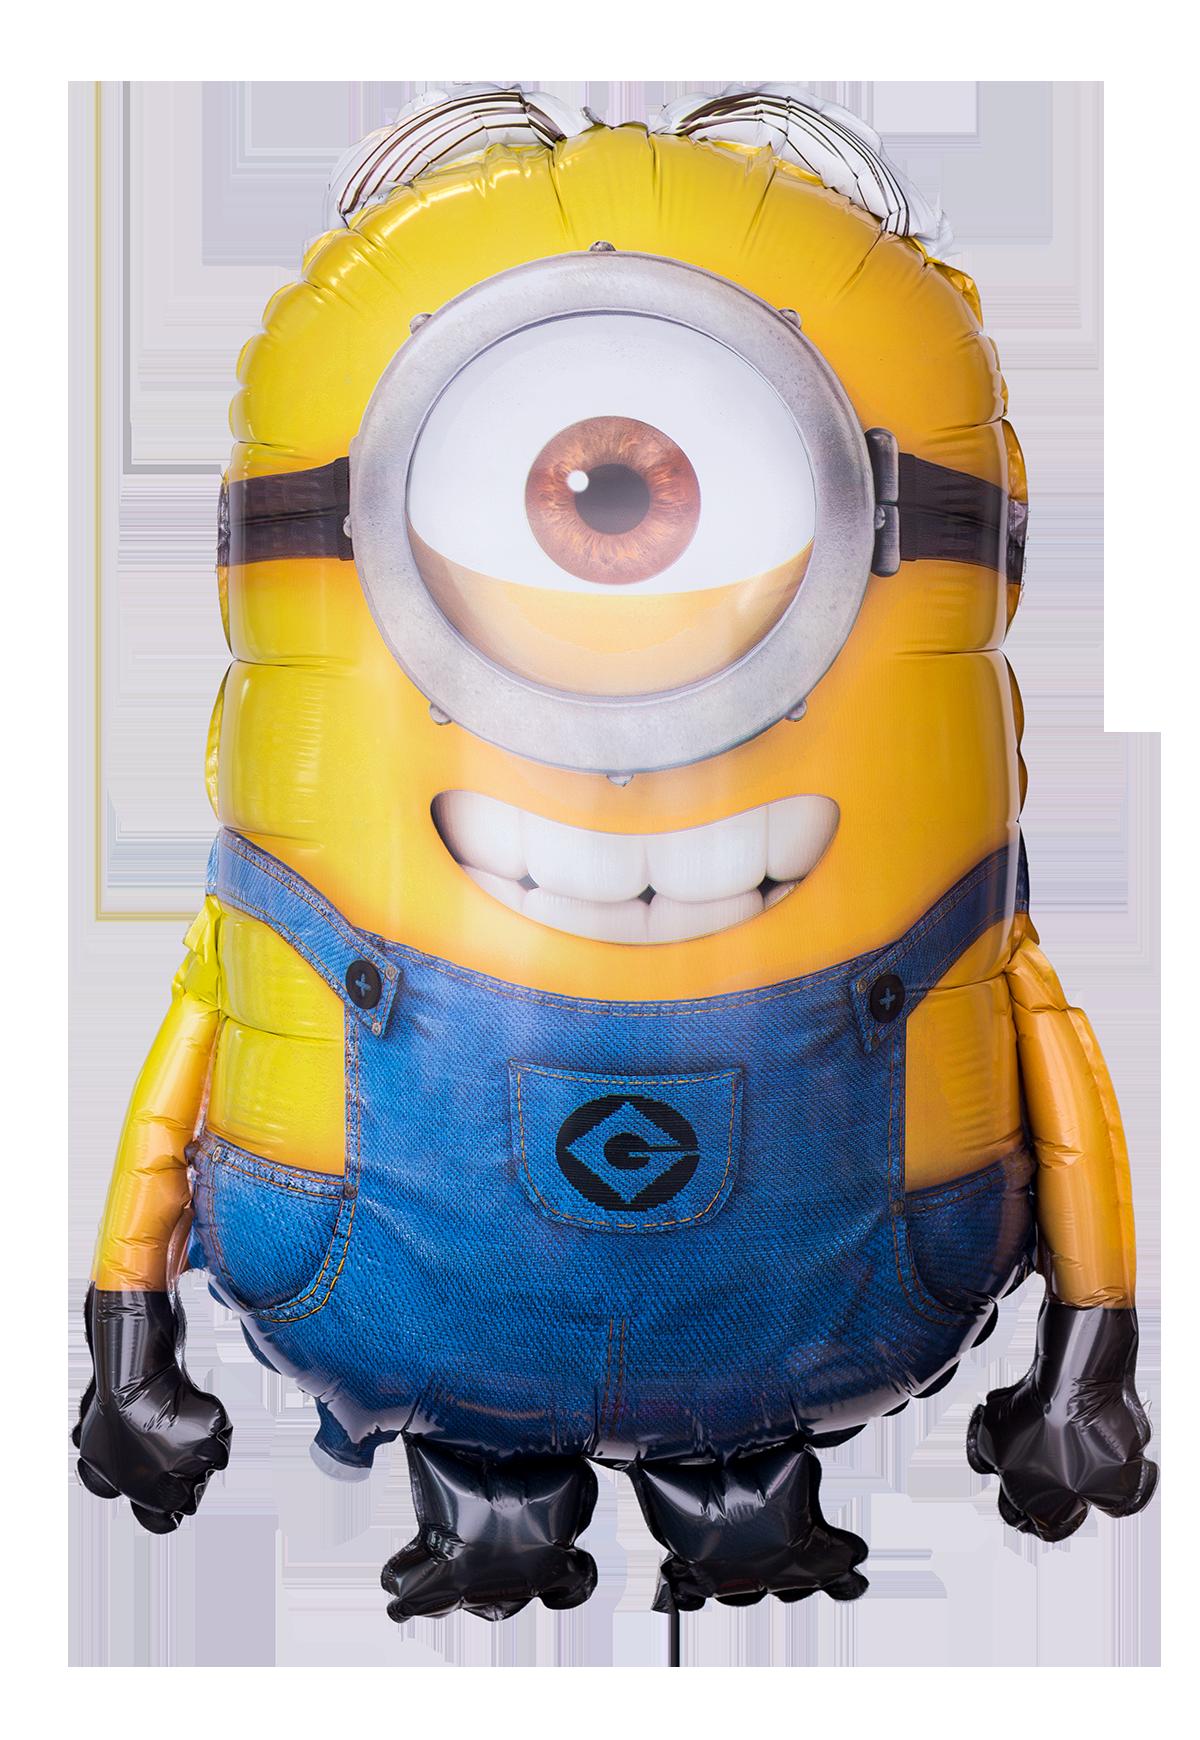 Minion Luftballon Minion Stuart | Geschenke für Kinder | Pinterest ...